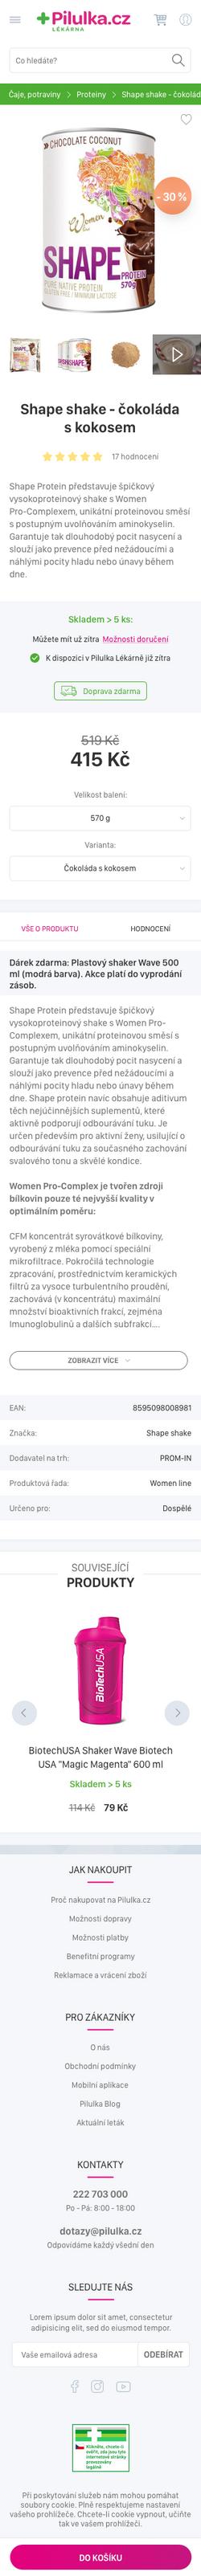 Detail produktu - mobile